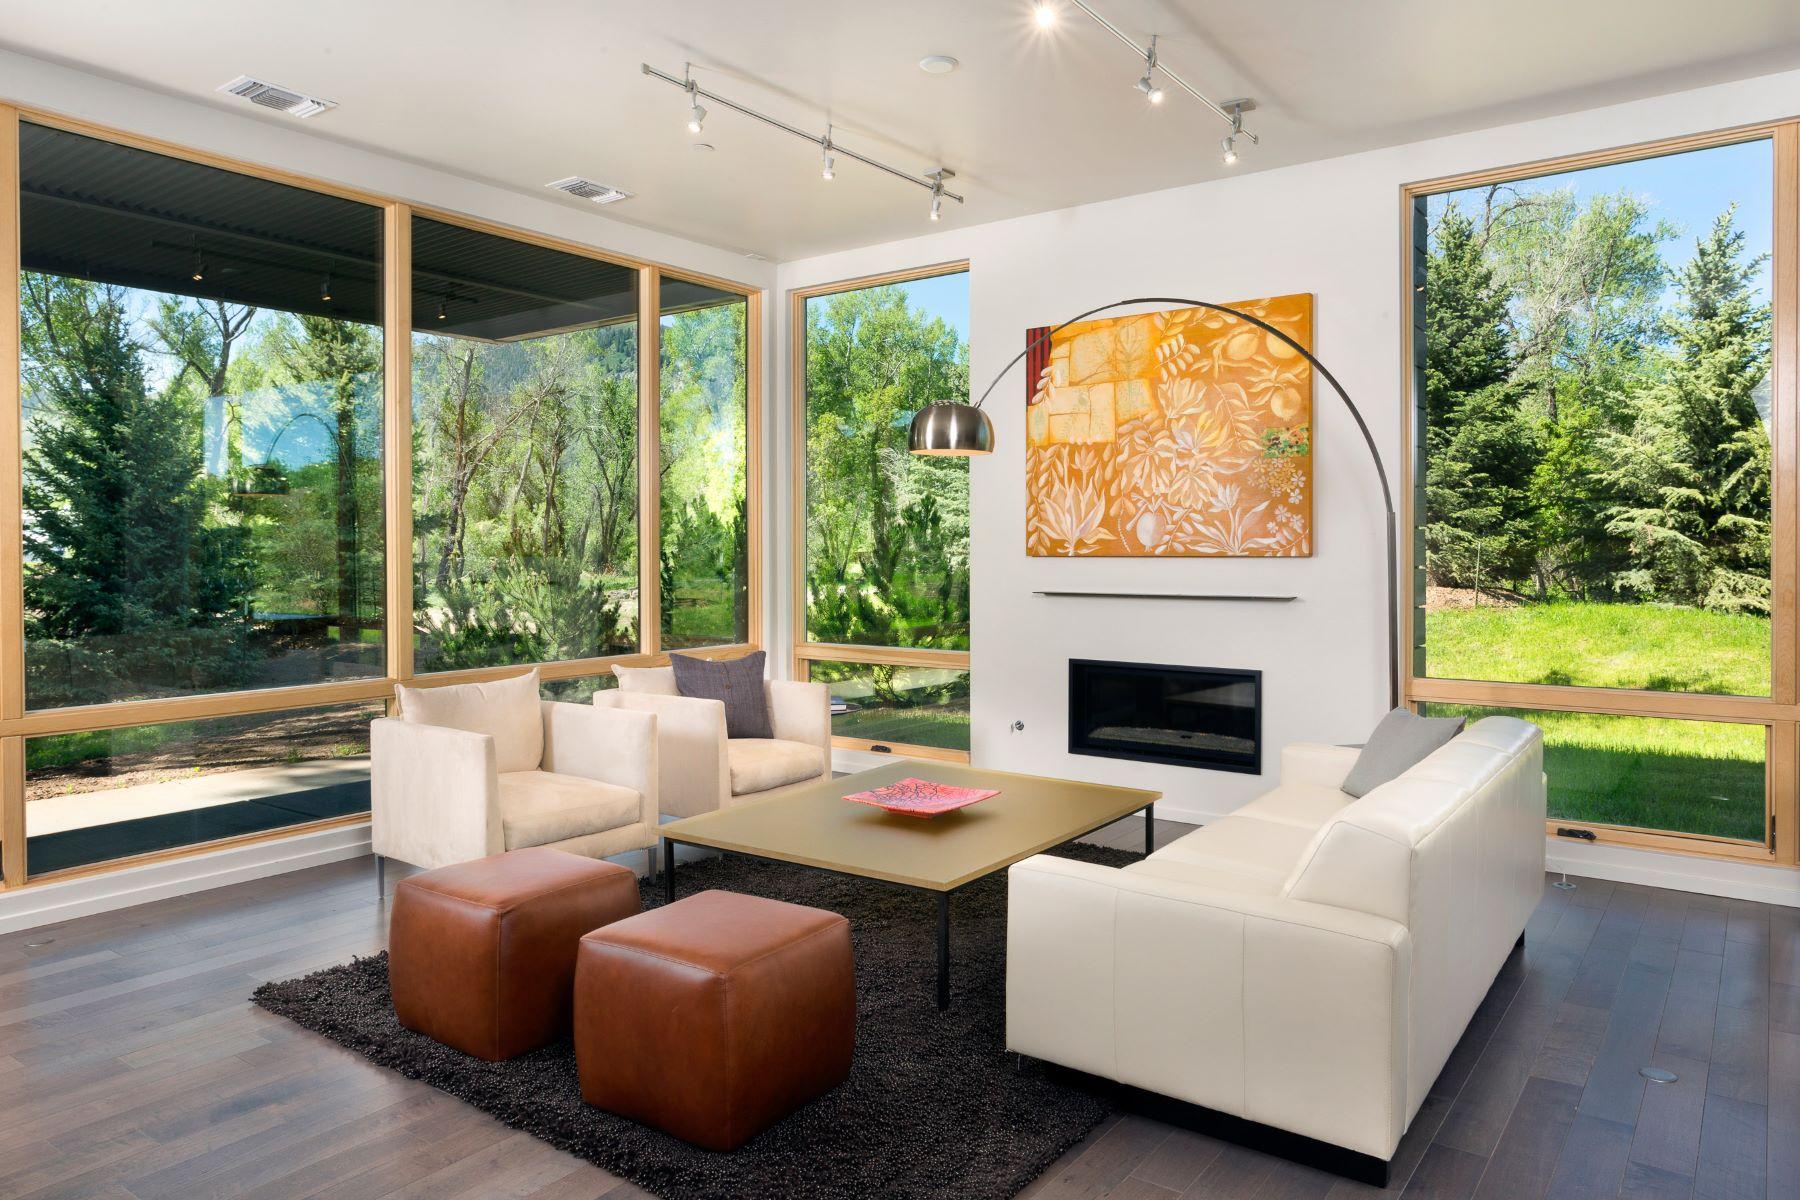 Condominiums 为 销售 在 Park Modern in Willits 100 Evans Road, Unit 204 巴萨尔特, 科罗拉多州 81621 美国